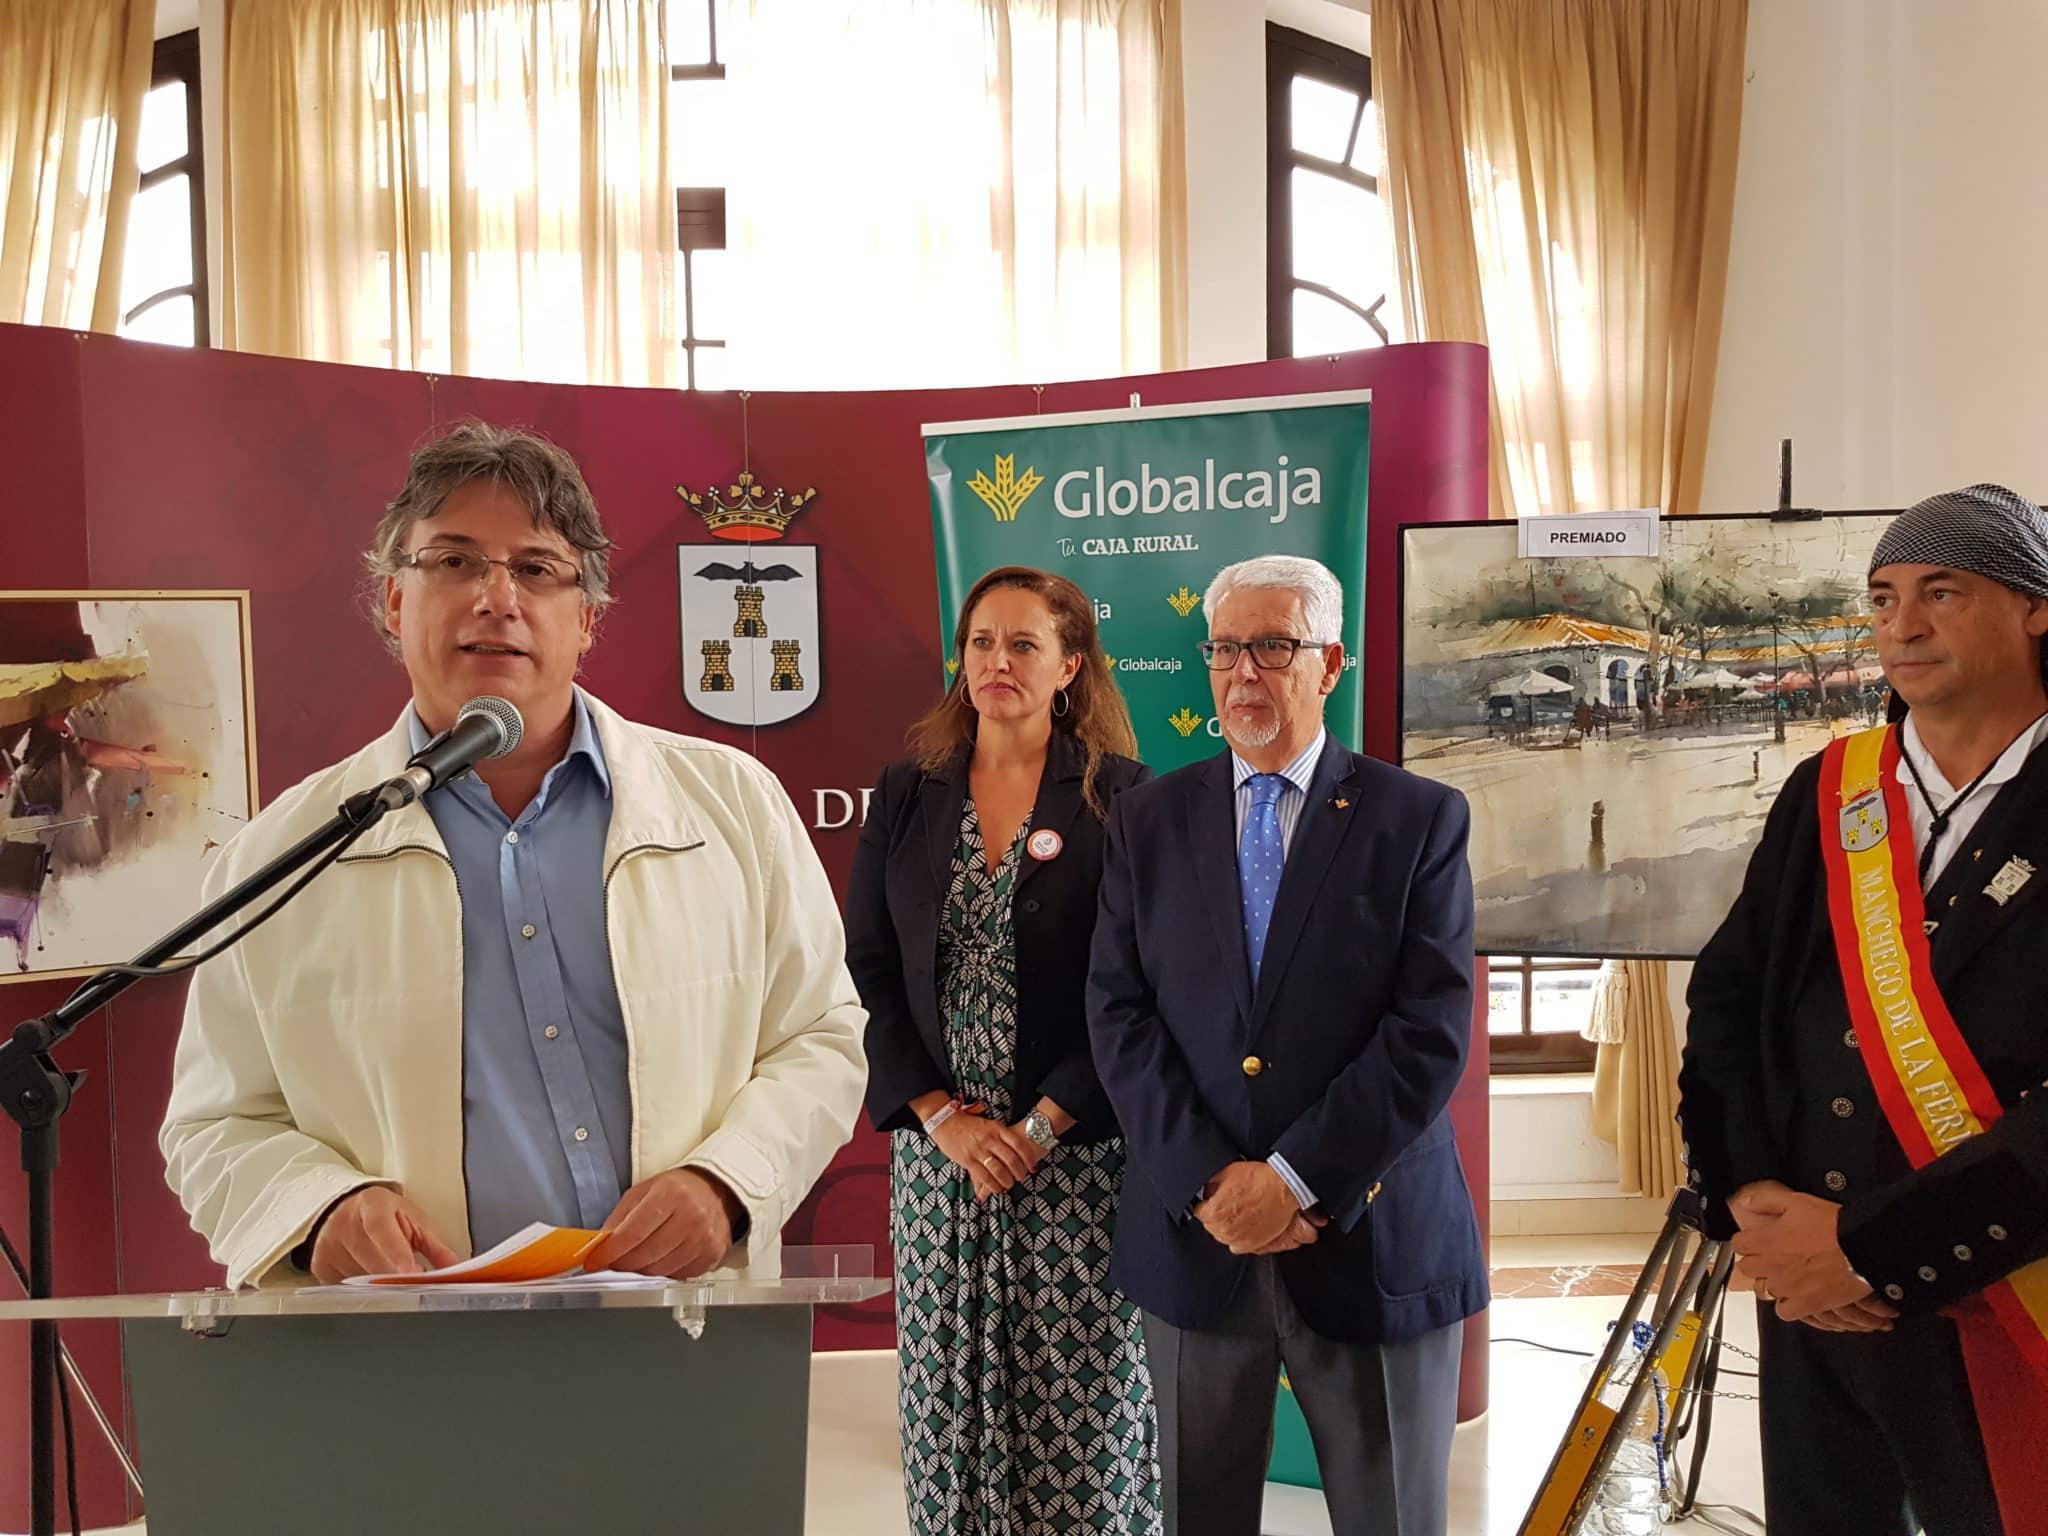 https://blog.globalcaja.es/wp-content/uploads/2019/09/Pintura-rapida-feria-de-albacete.jpg